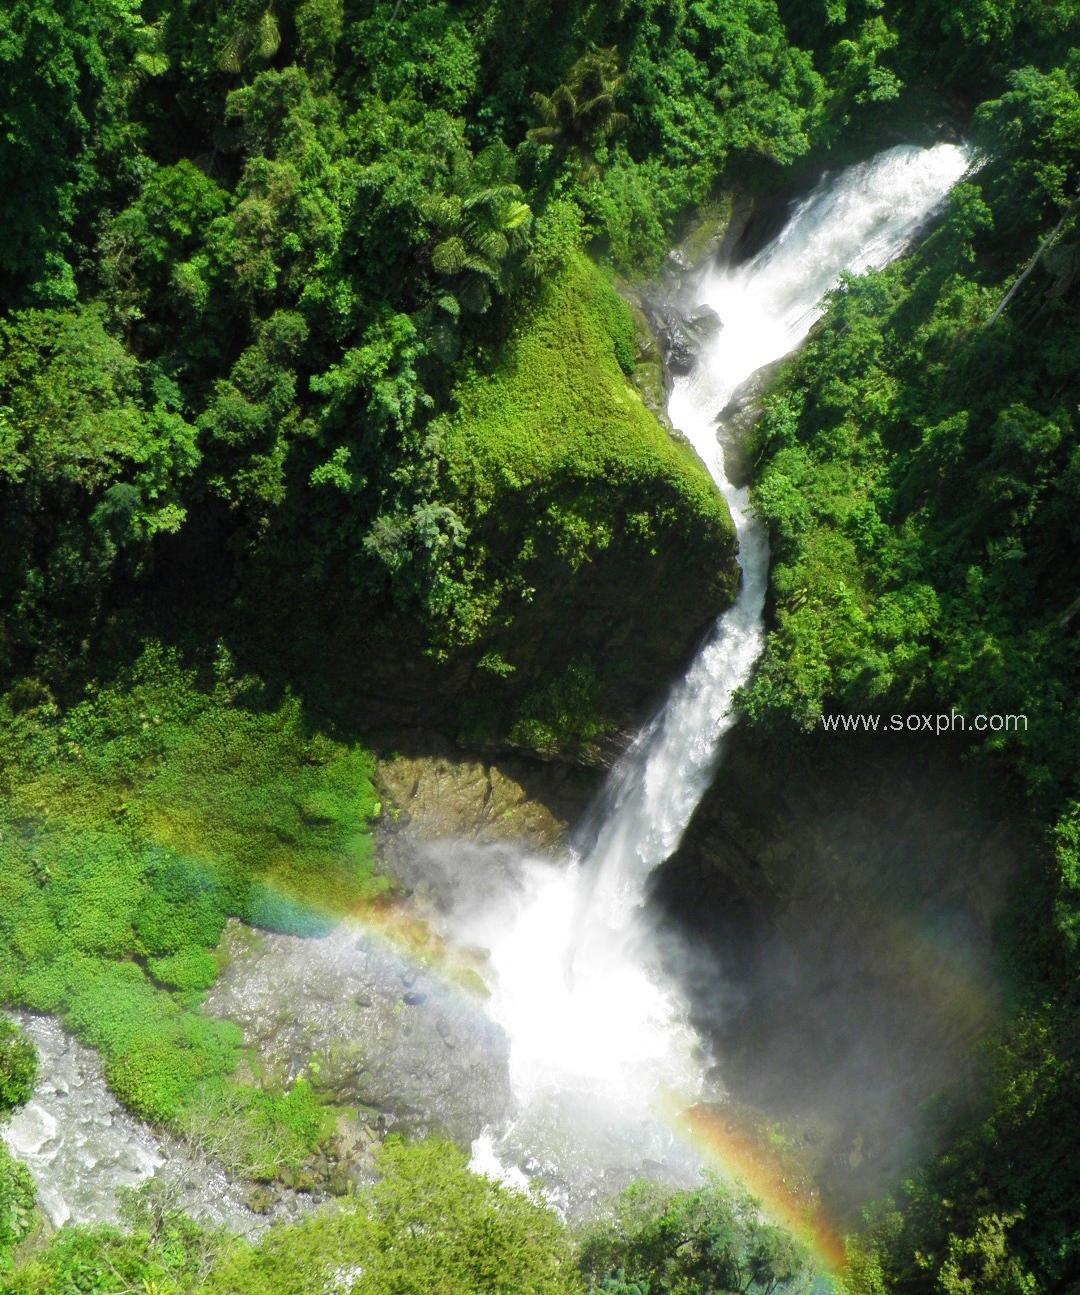 Hikong B'lebed | Seven Falls